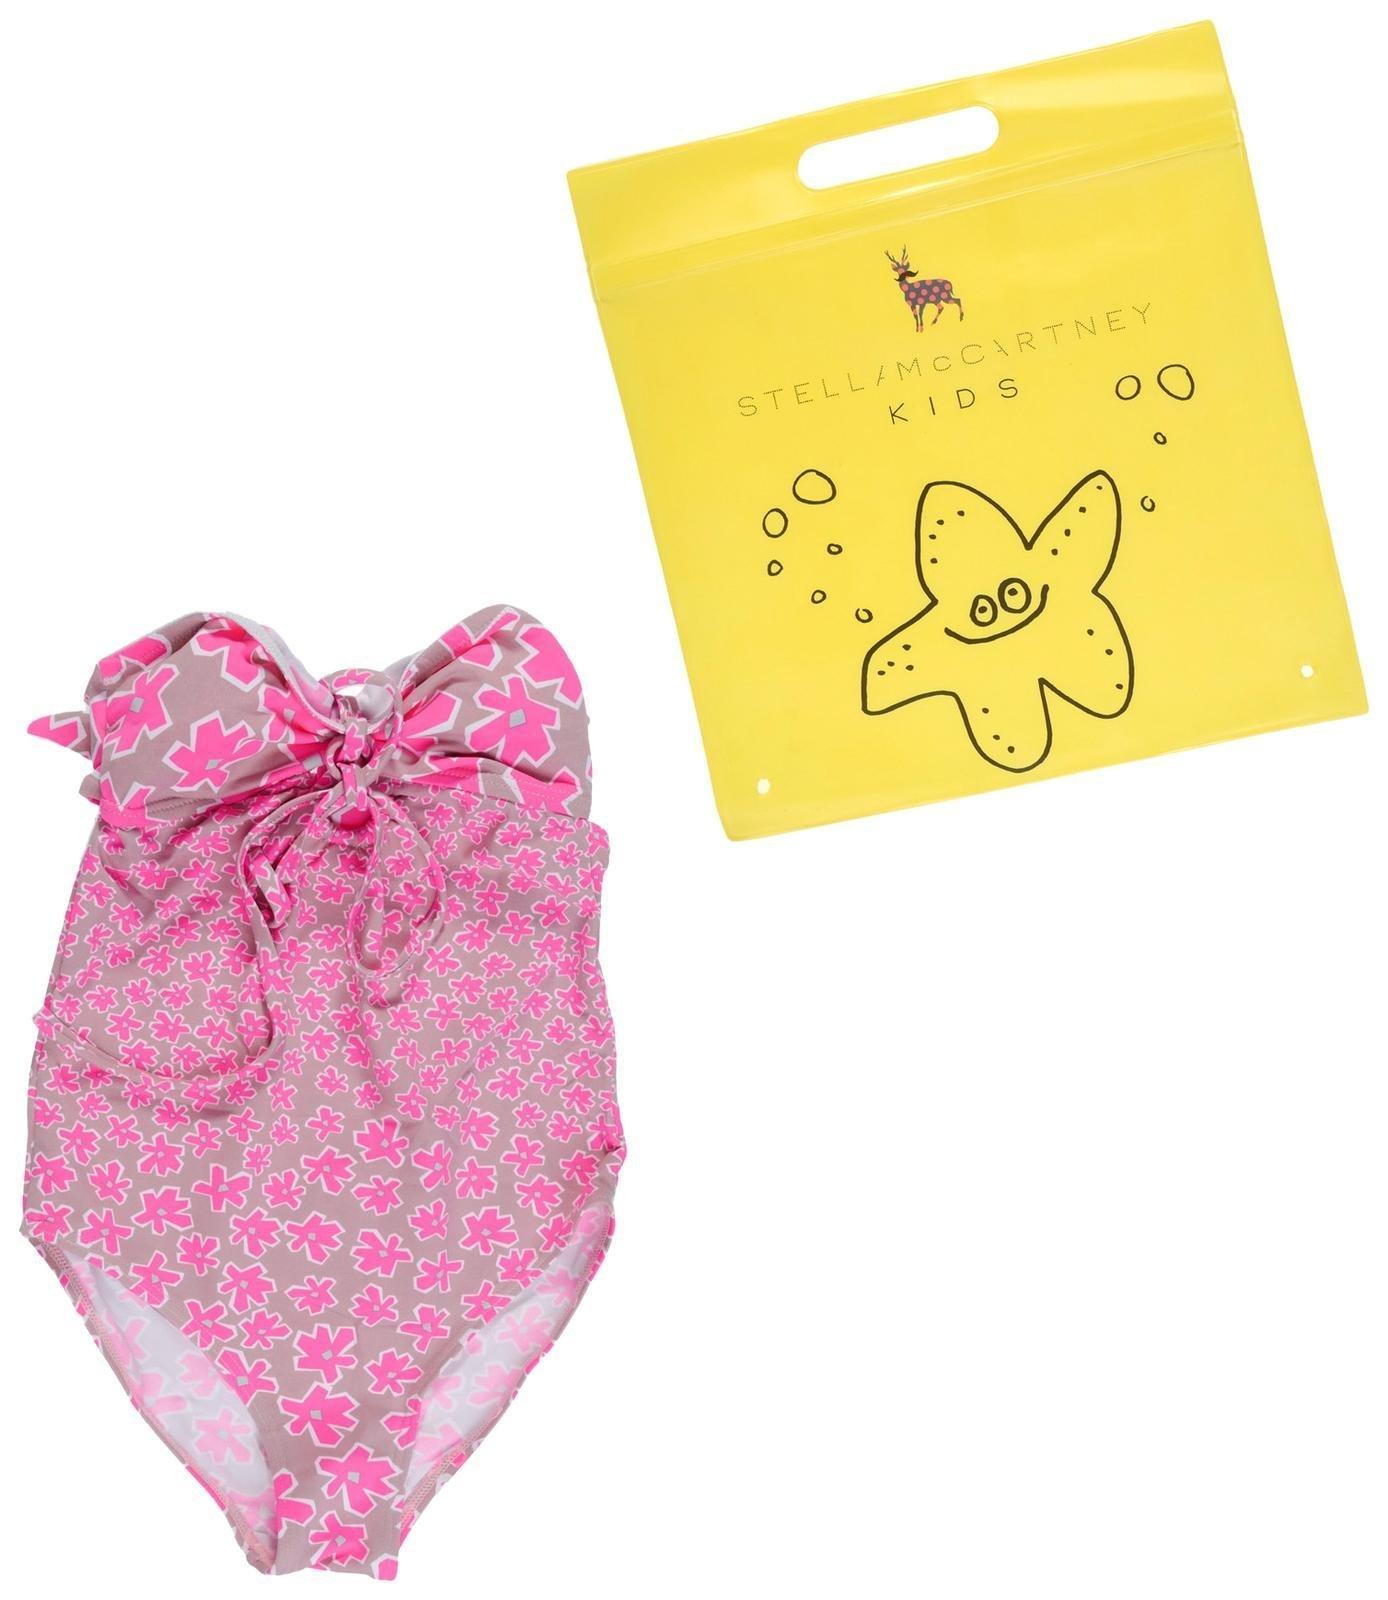 Stella McCartney Kids Girls' Anouk Daisy Print One Piece Swimsuit, Pink, 3